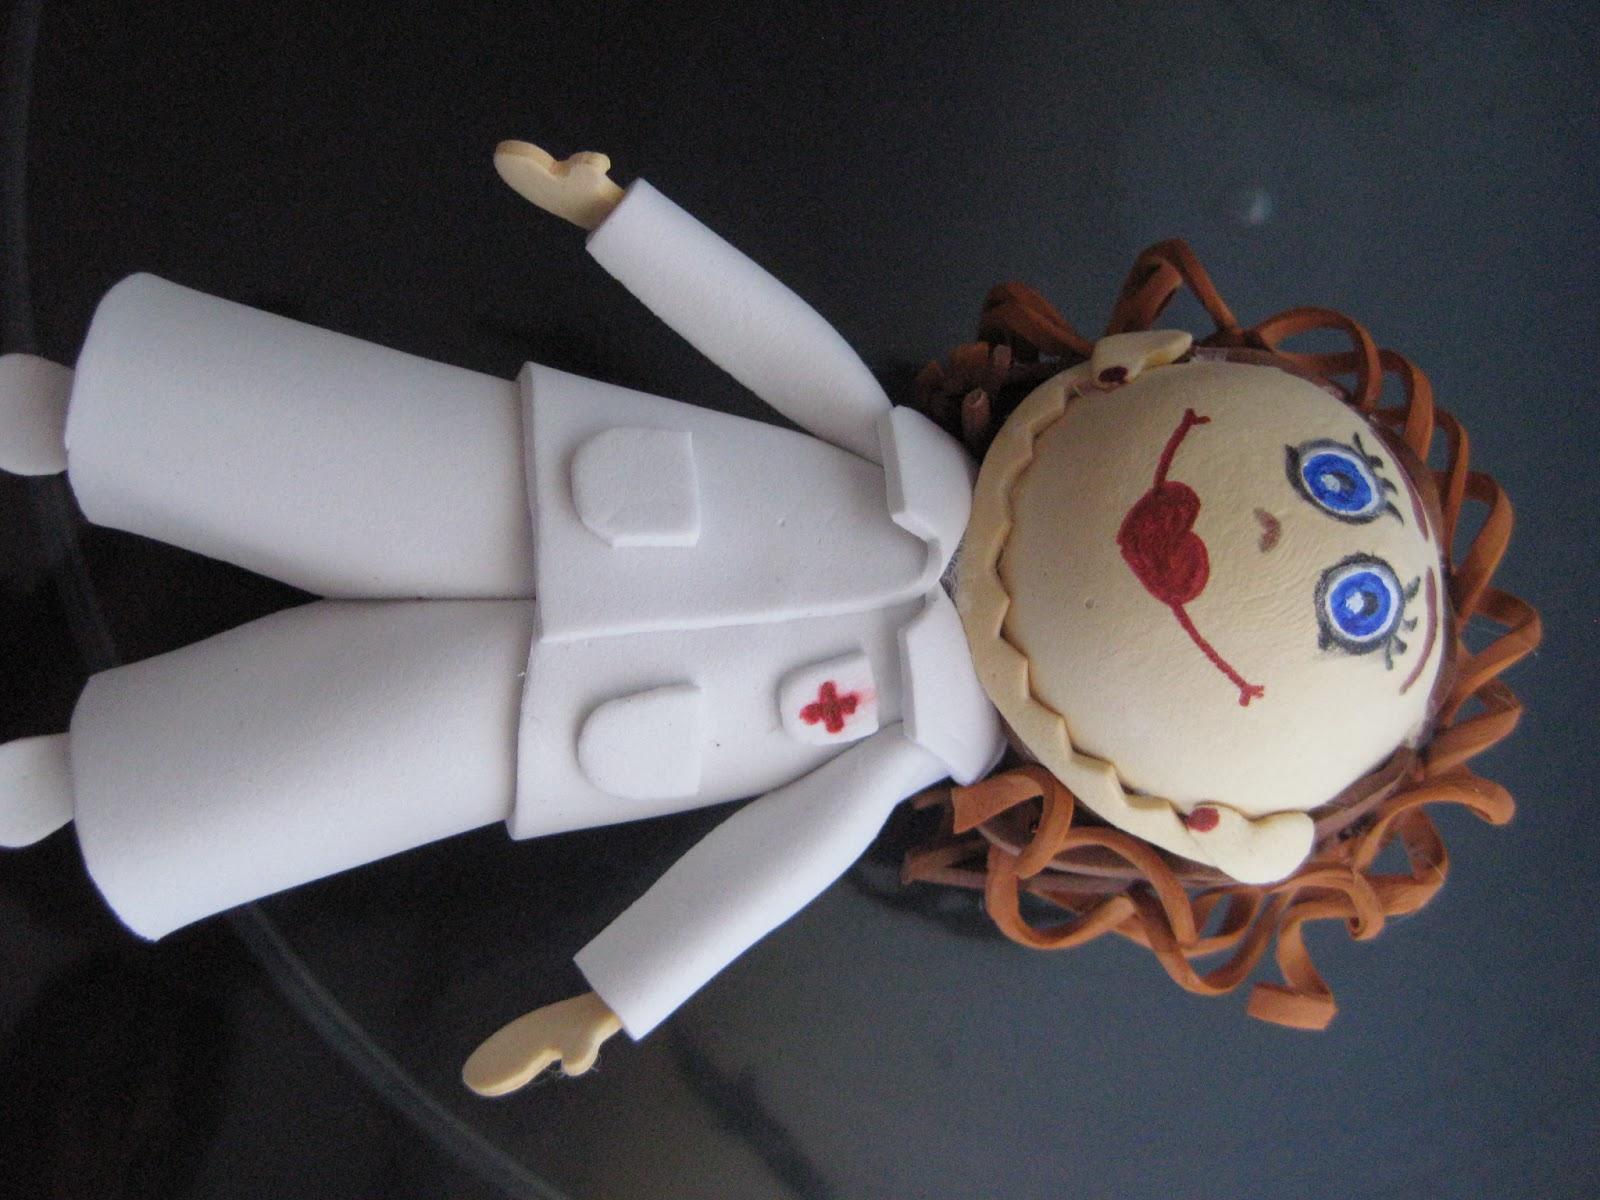 Manualidades Fofucha enfermera hecha a mano en Pozoblanco